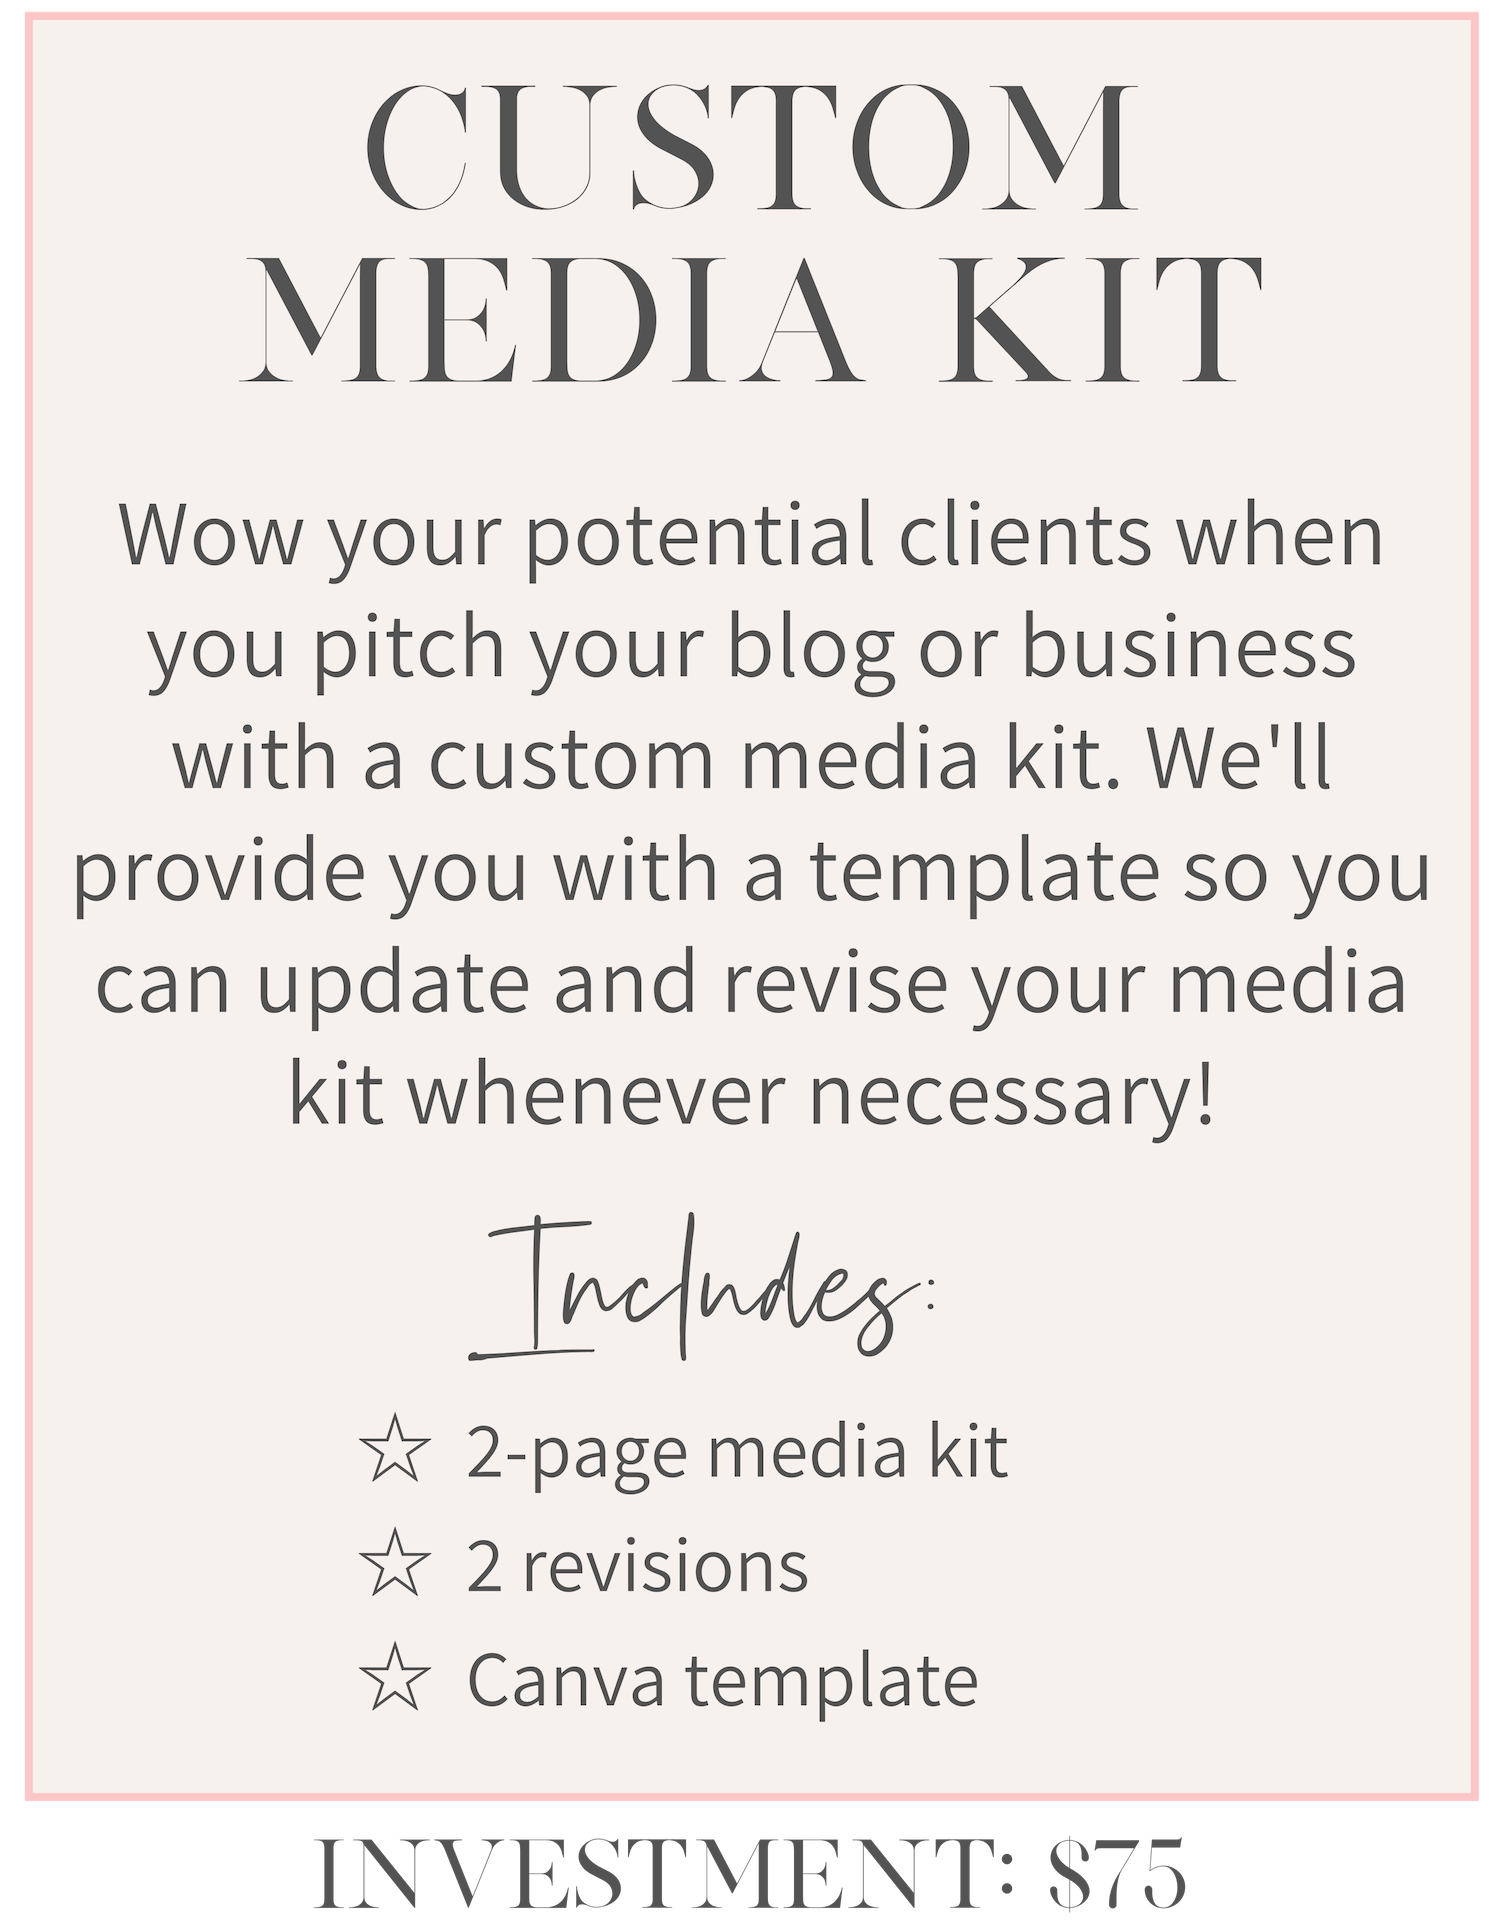 girlcrush collective media kit design service